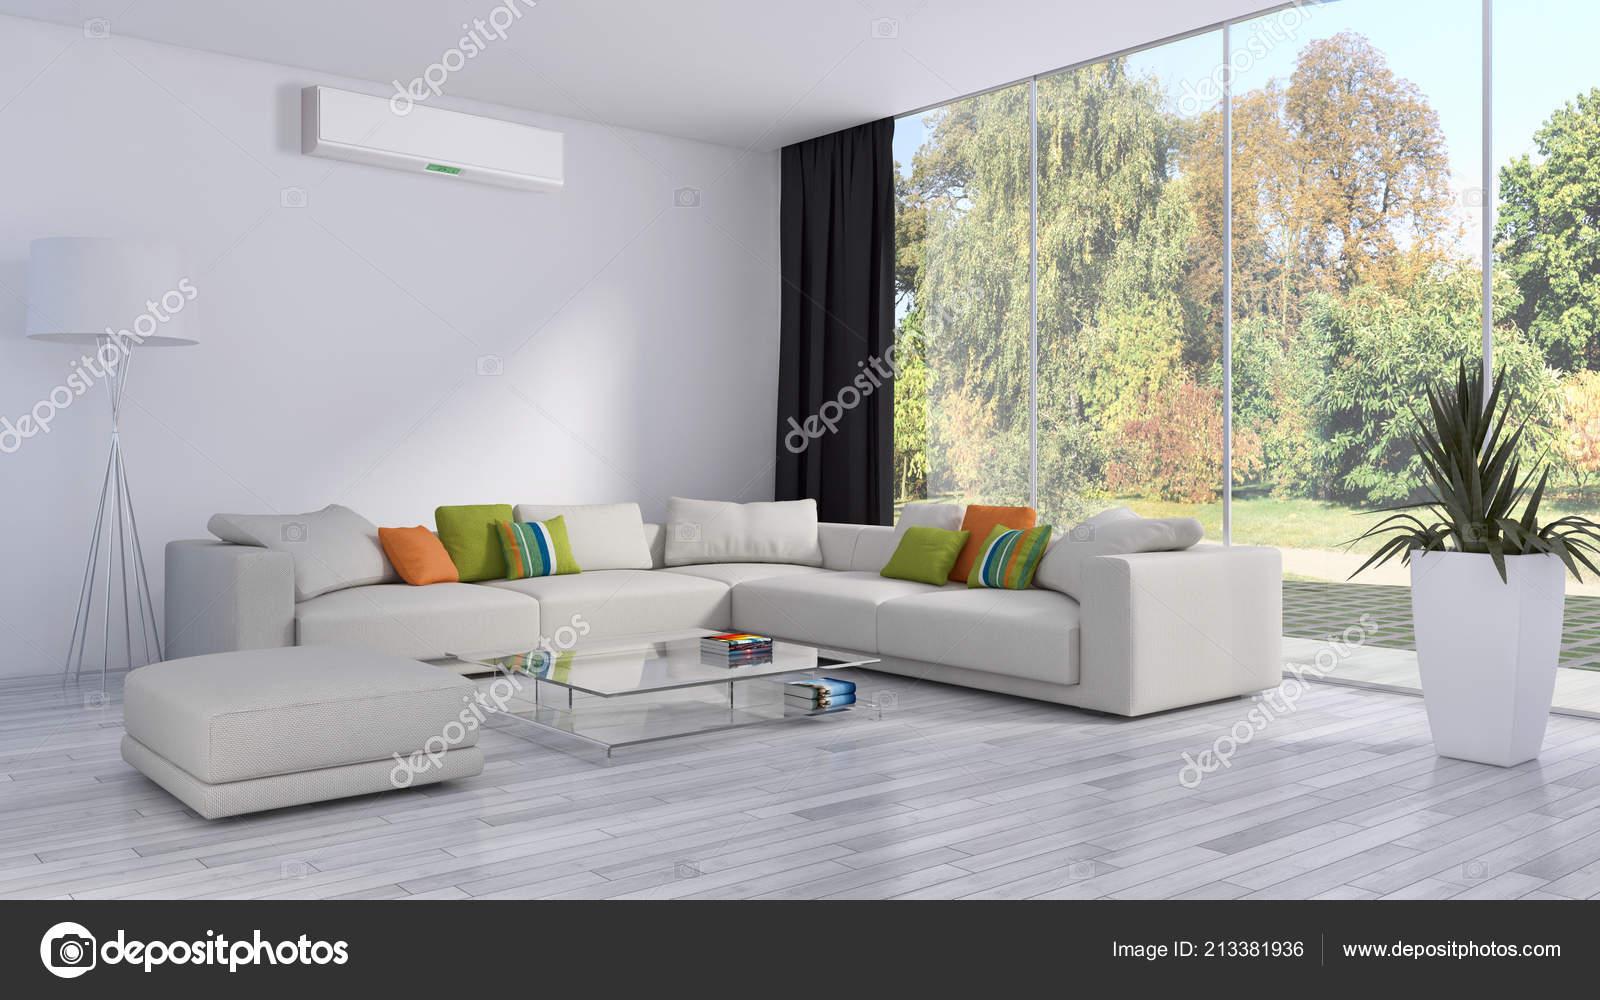 https://st4.depositphotos.com/15869754/21338/i/1600/depositphotos_213381936-stock-photo-modern-bright-interiors-apartment-living.jpg